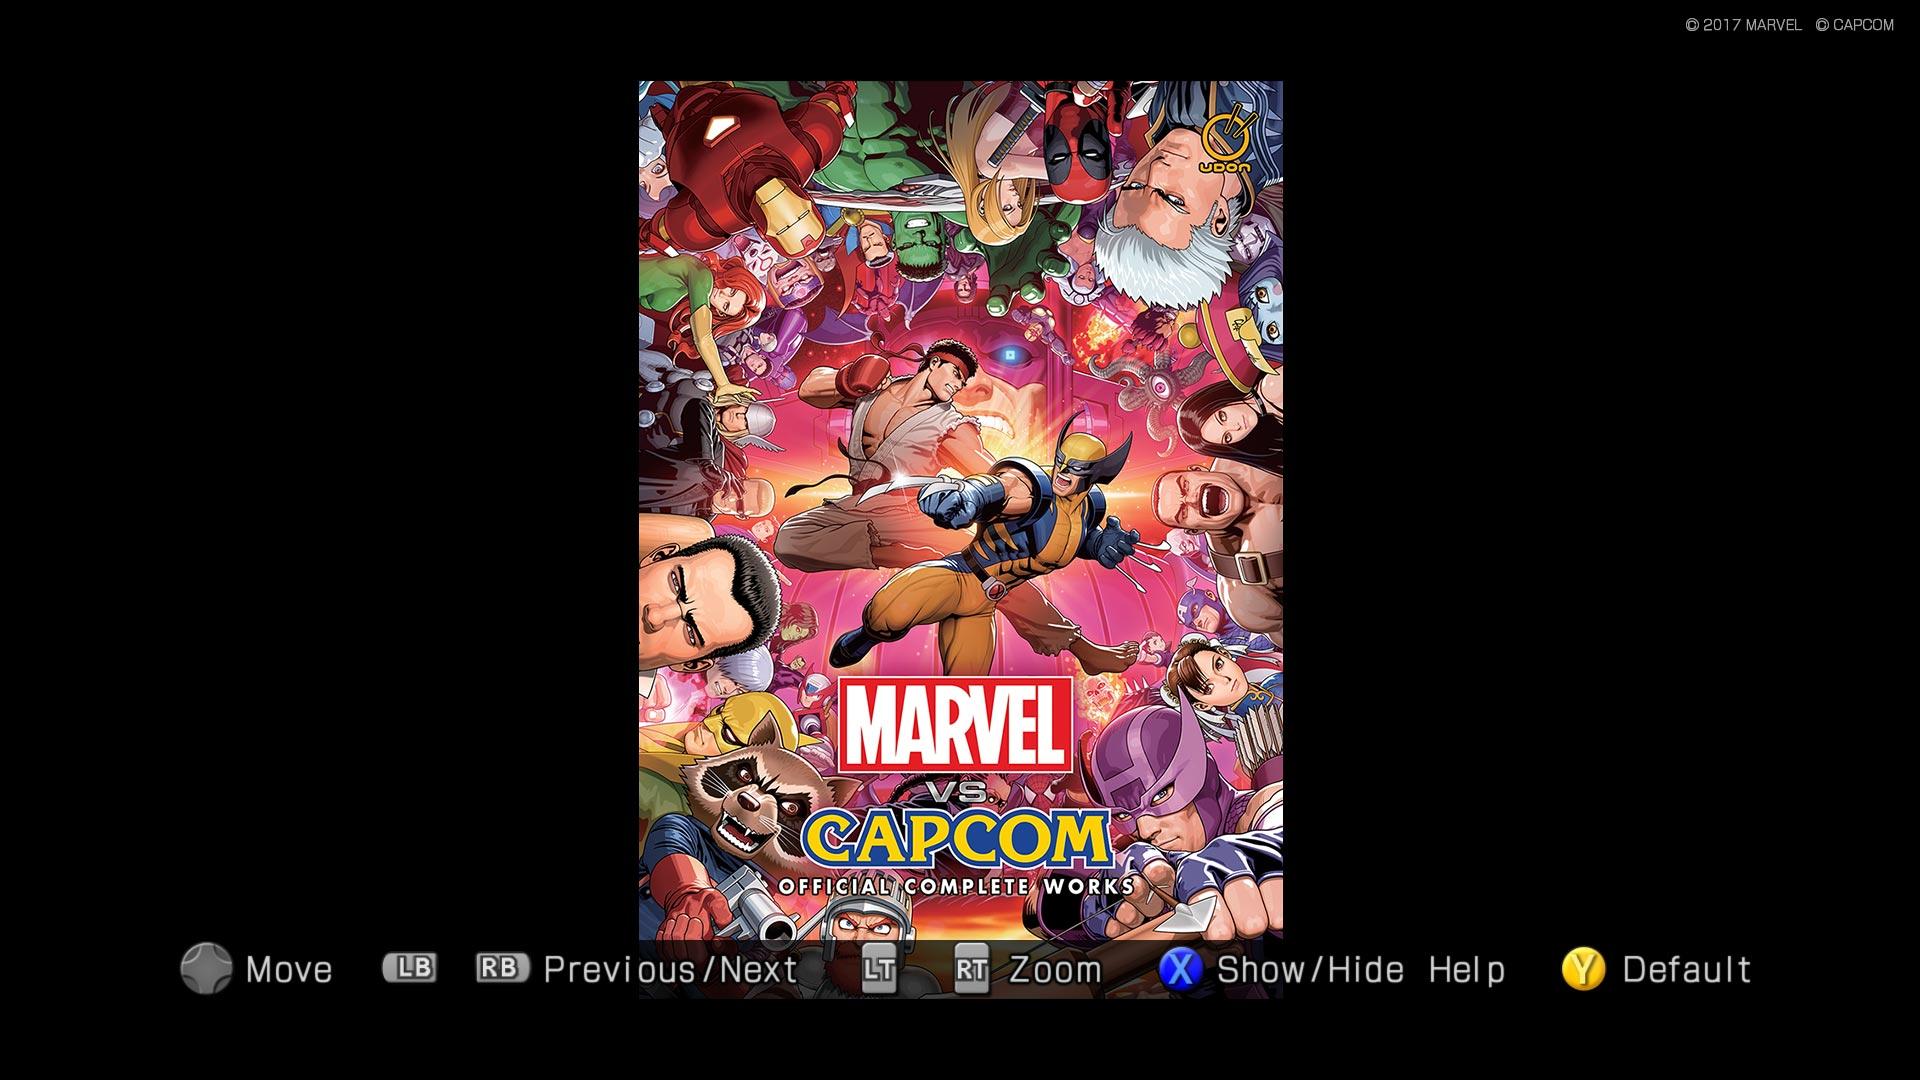 ULTIMATE MARVEL VS. CAPCOM 3 screenshot